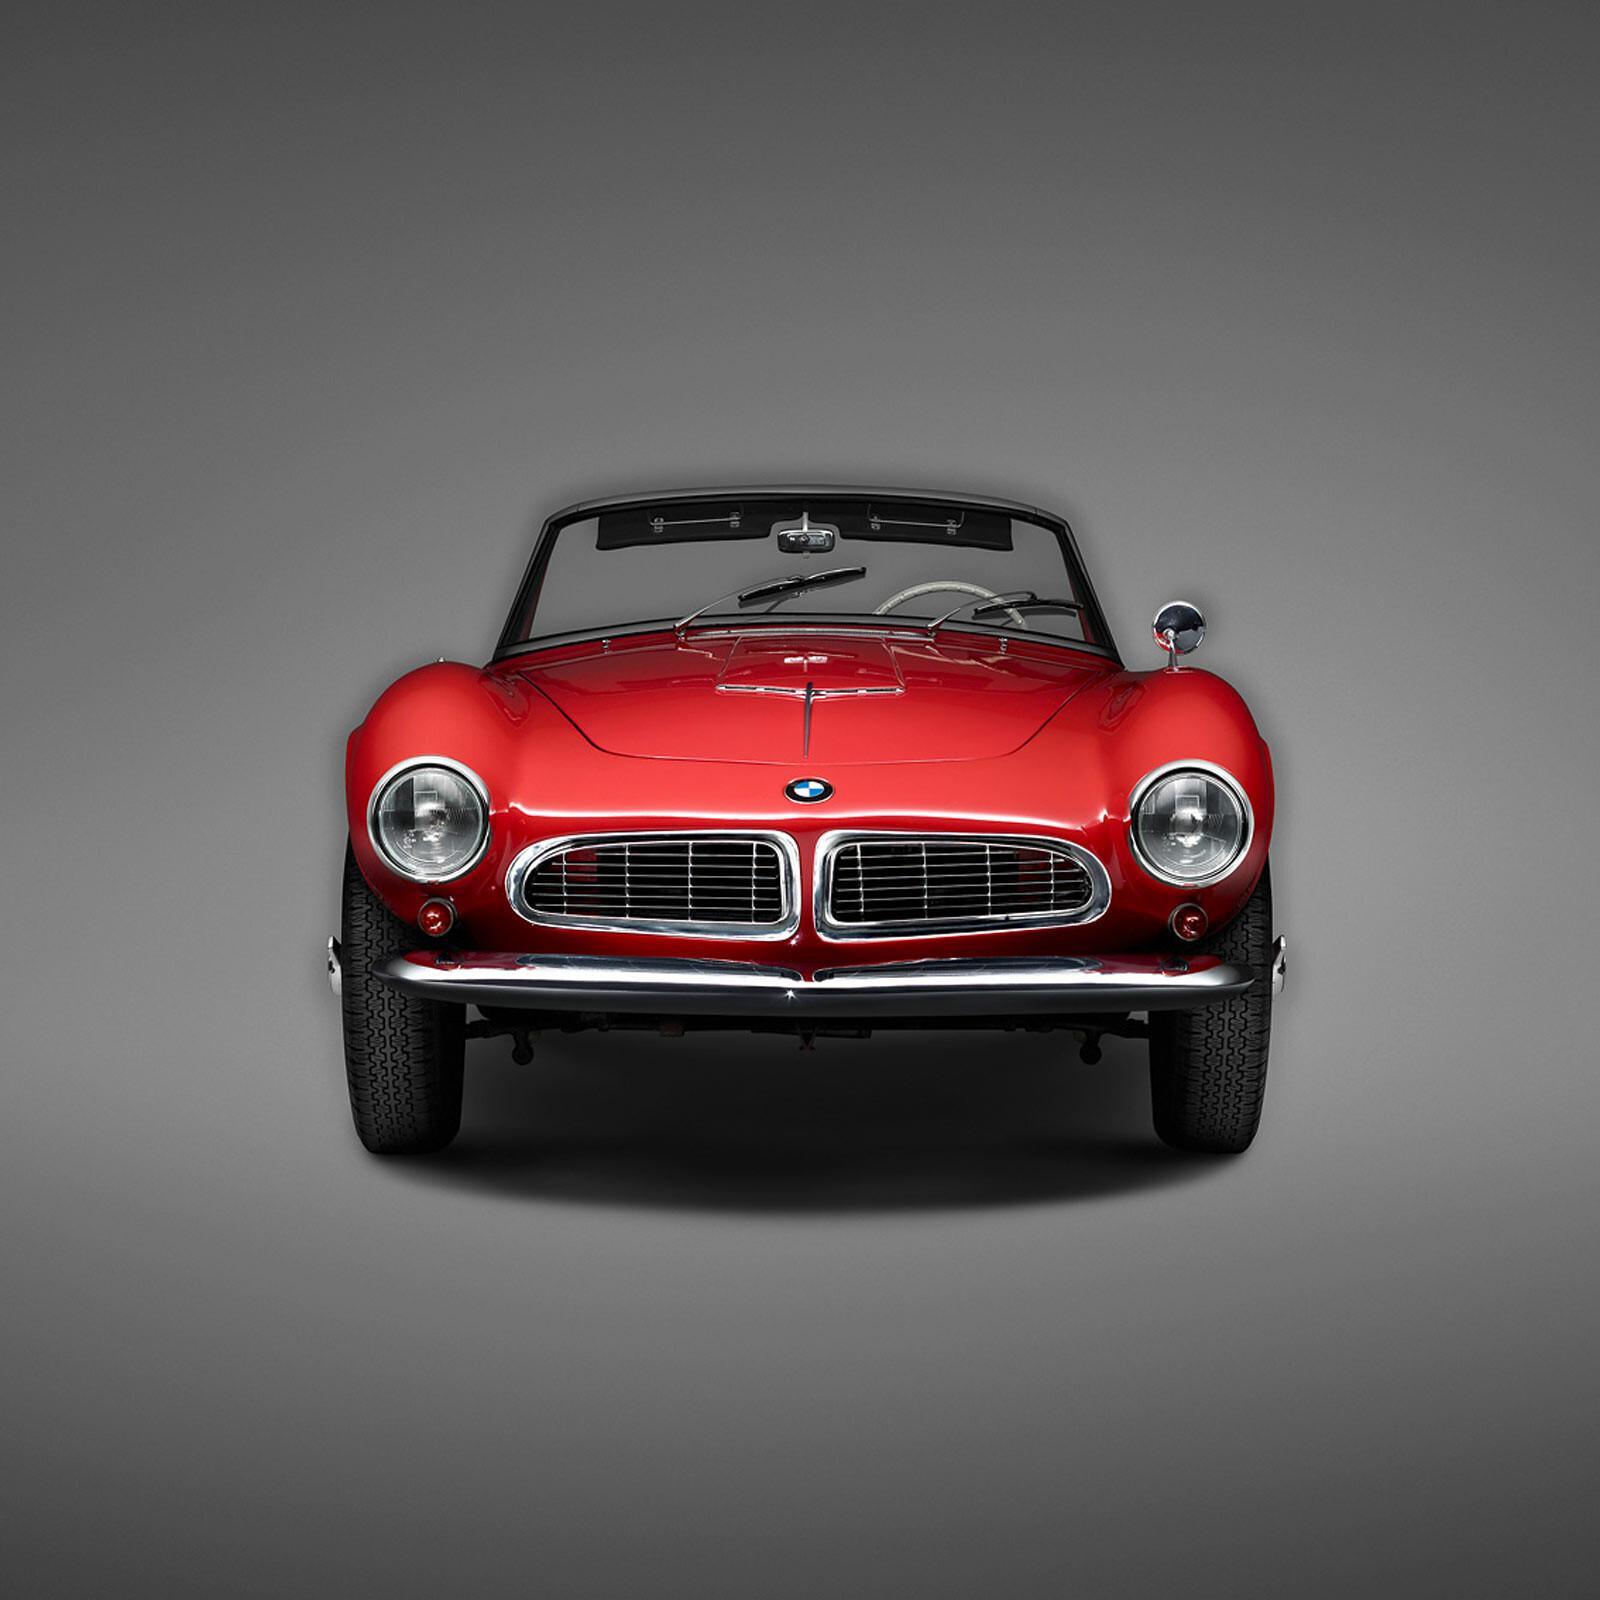 BMW 507 Front - Bmw Edition | Erik Chmil